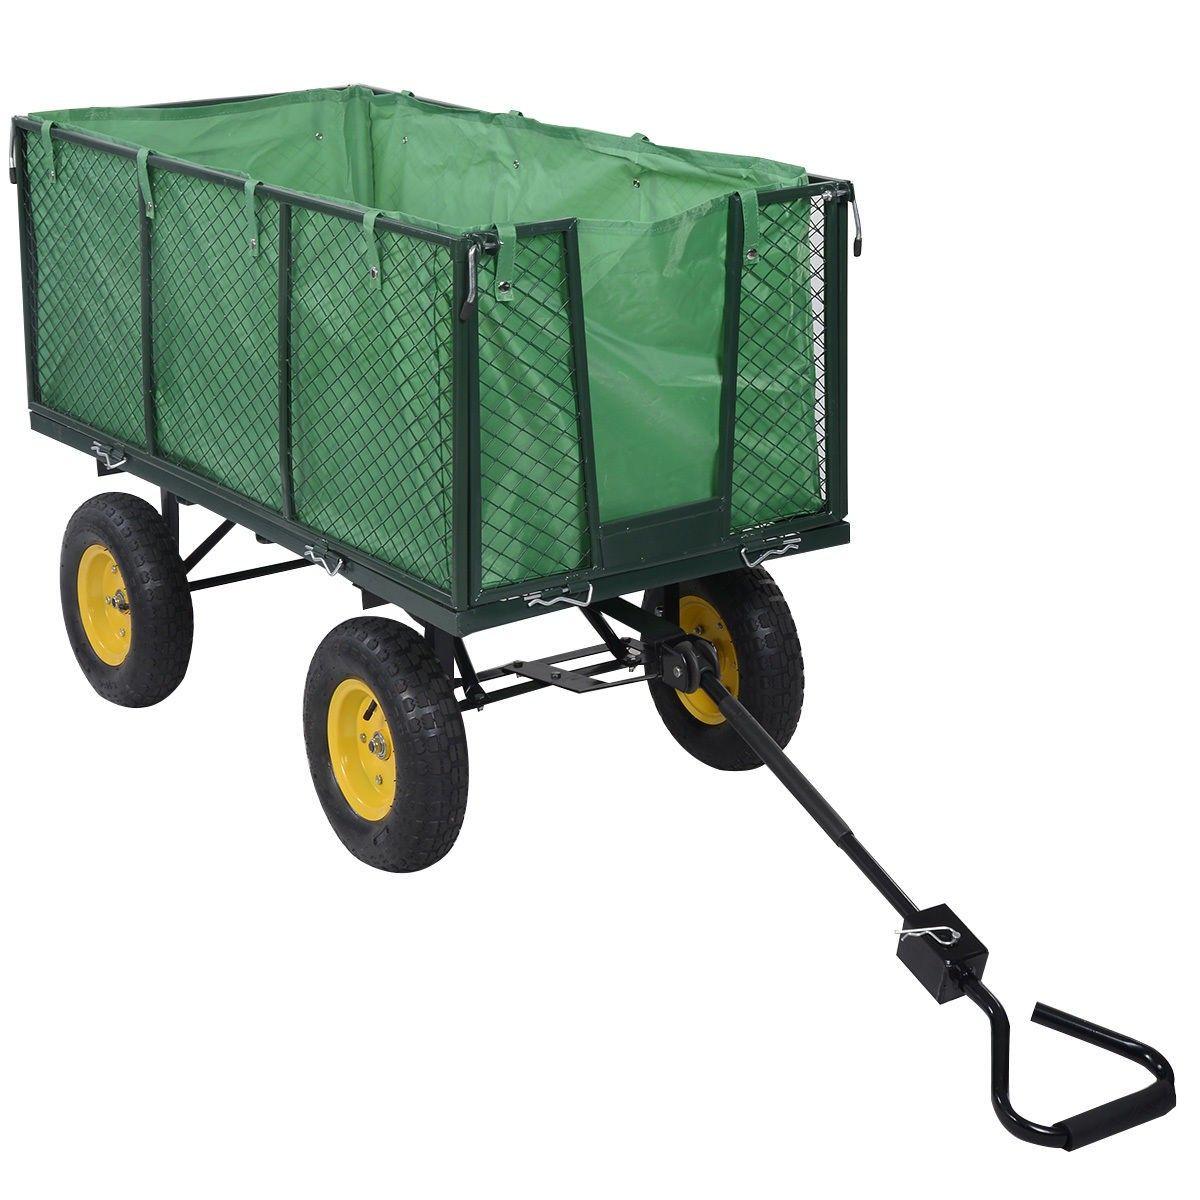 Large Collapsible Utility Wagon Garden Cart Shopping Buggy Yard Beach Heavy  Duty   Lawn U0026 Garden